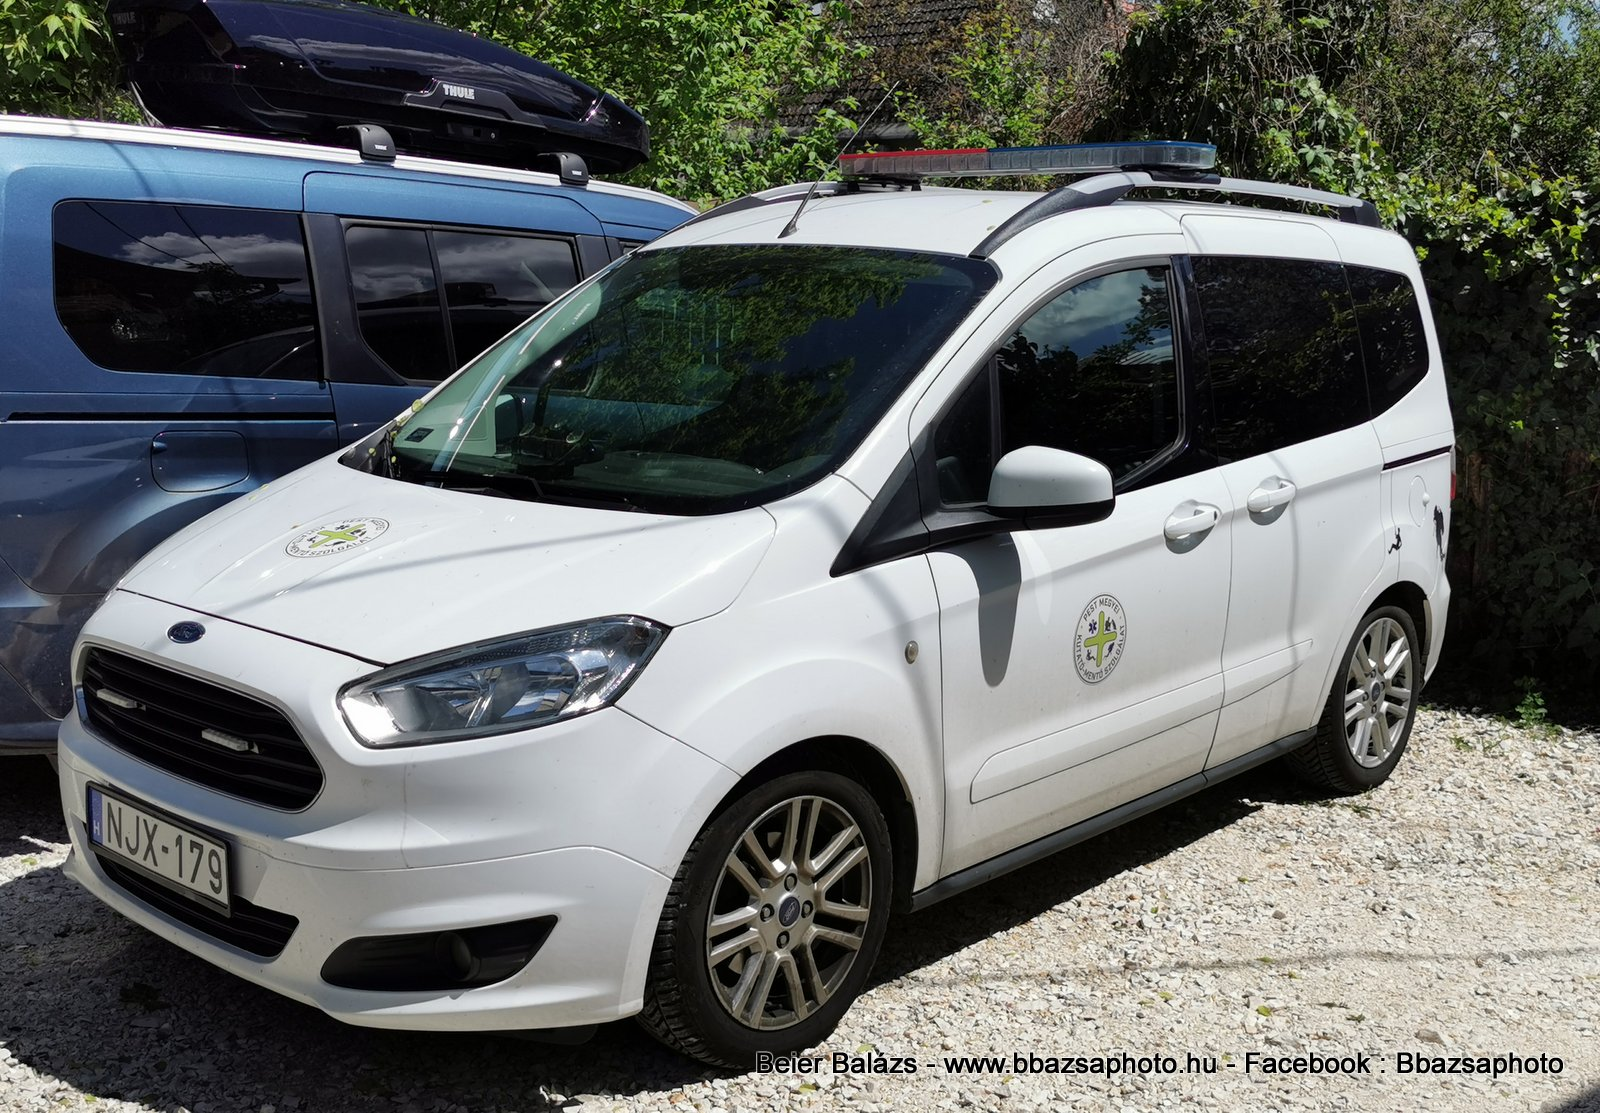 Ford Tourneo Courier – Pest megyei kutató mentő